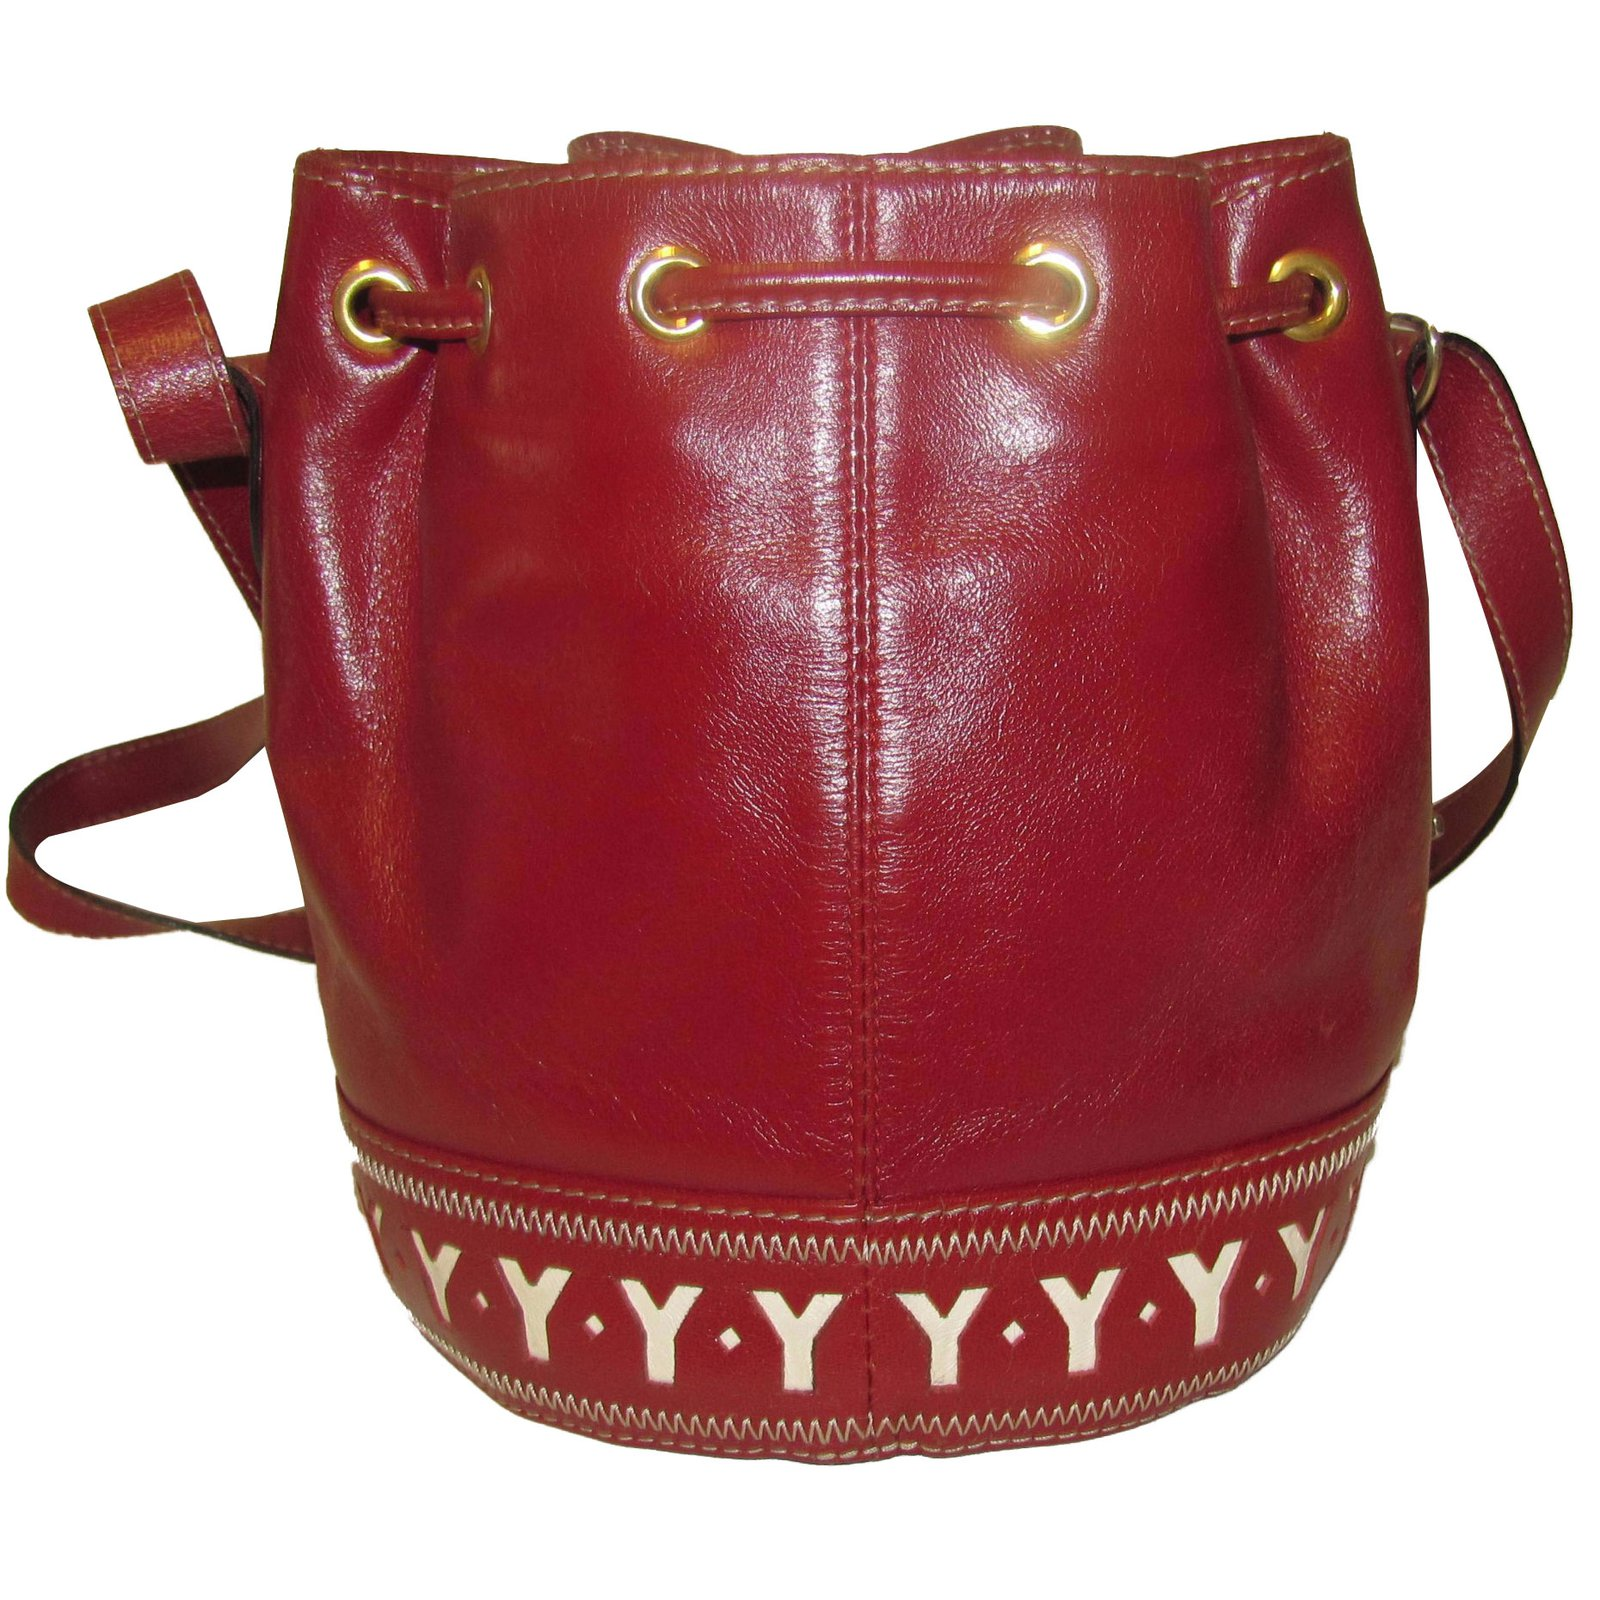 5a341334e7cf Yves Saint Laurent bucket bag Handbags Leather Red